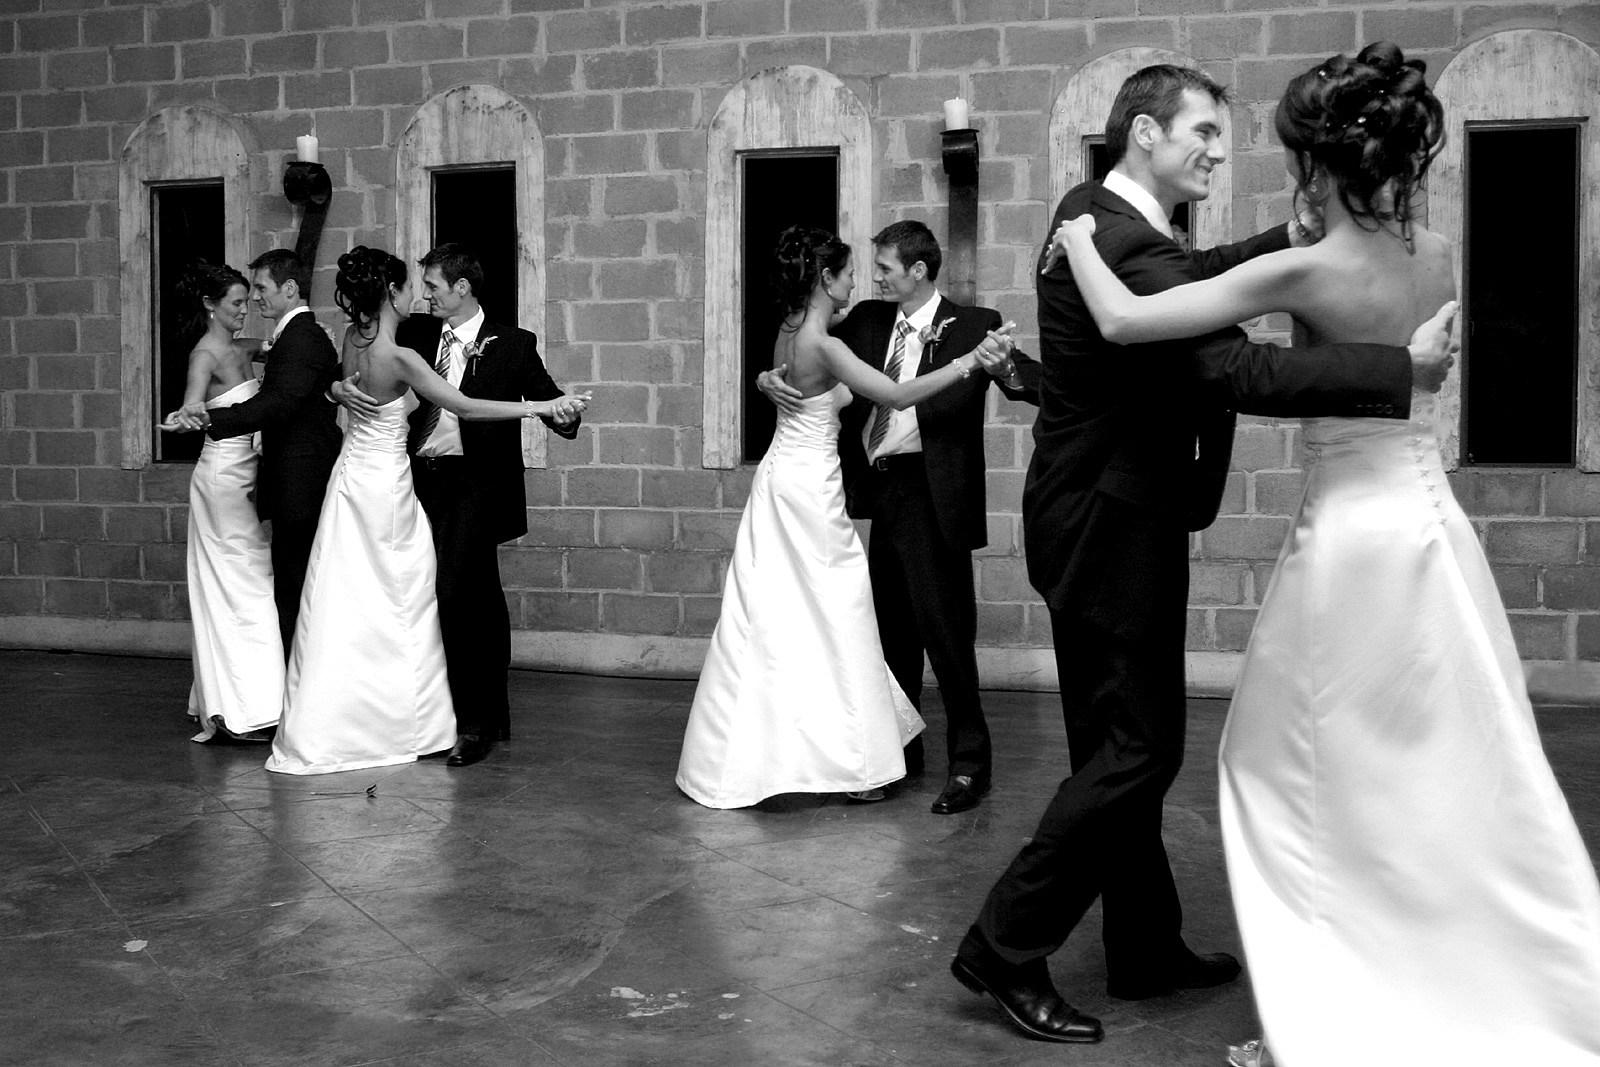 Dance Music For Weddings